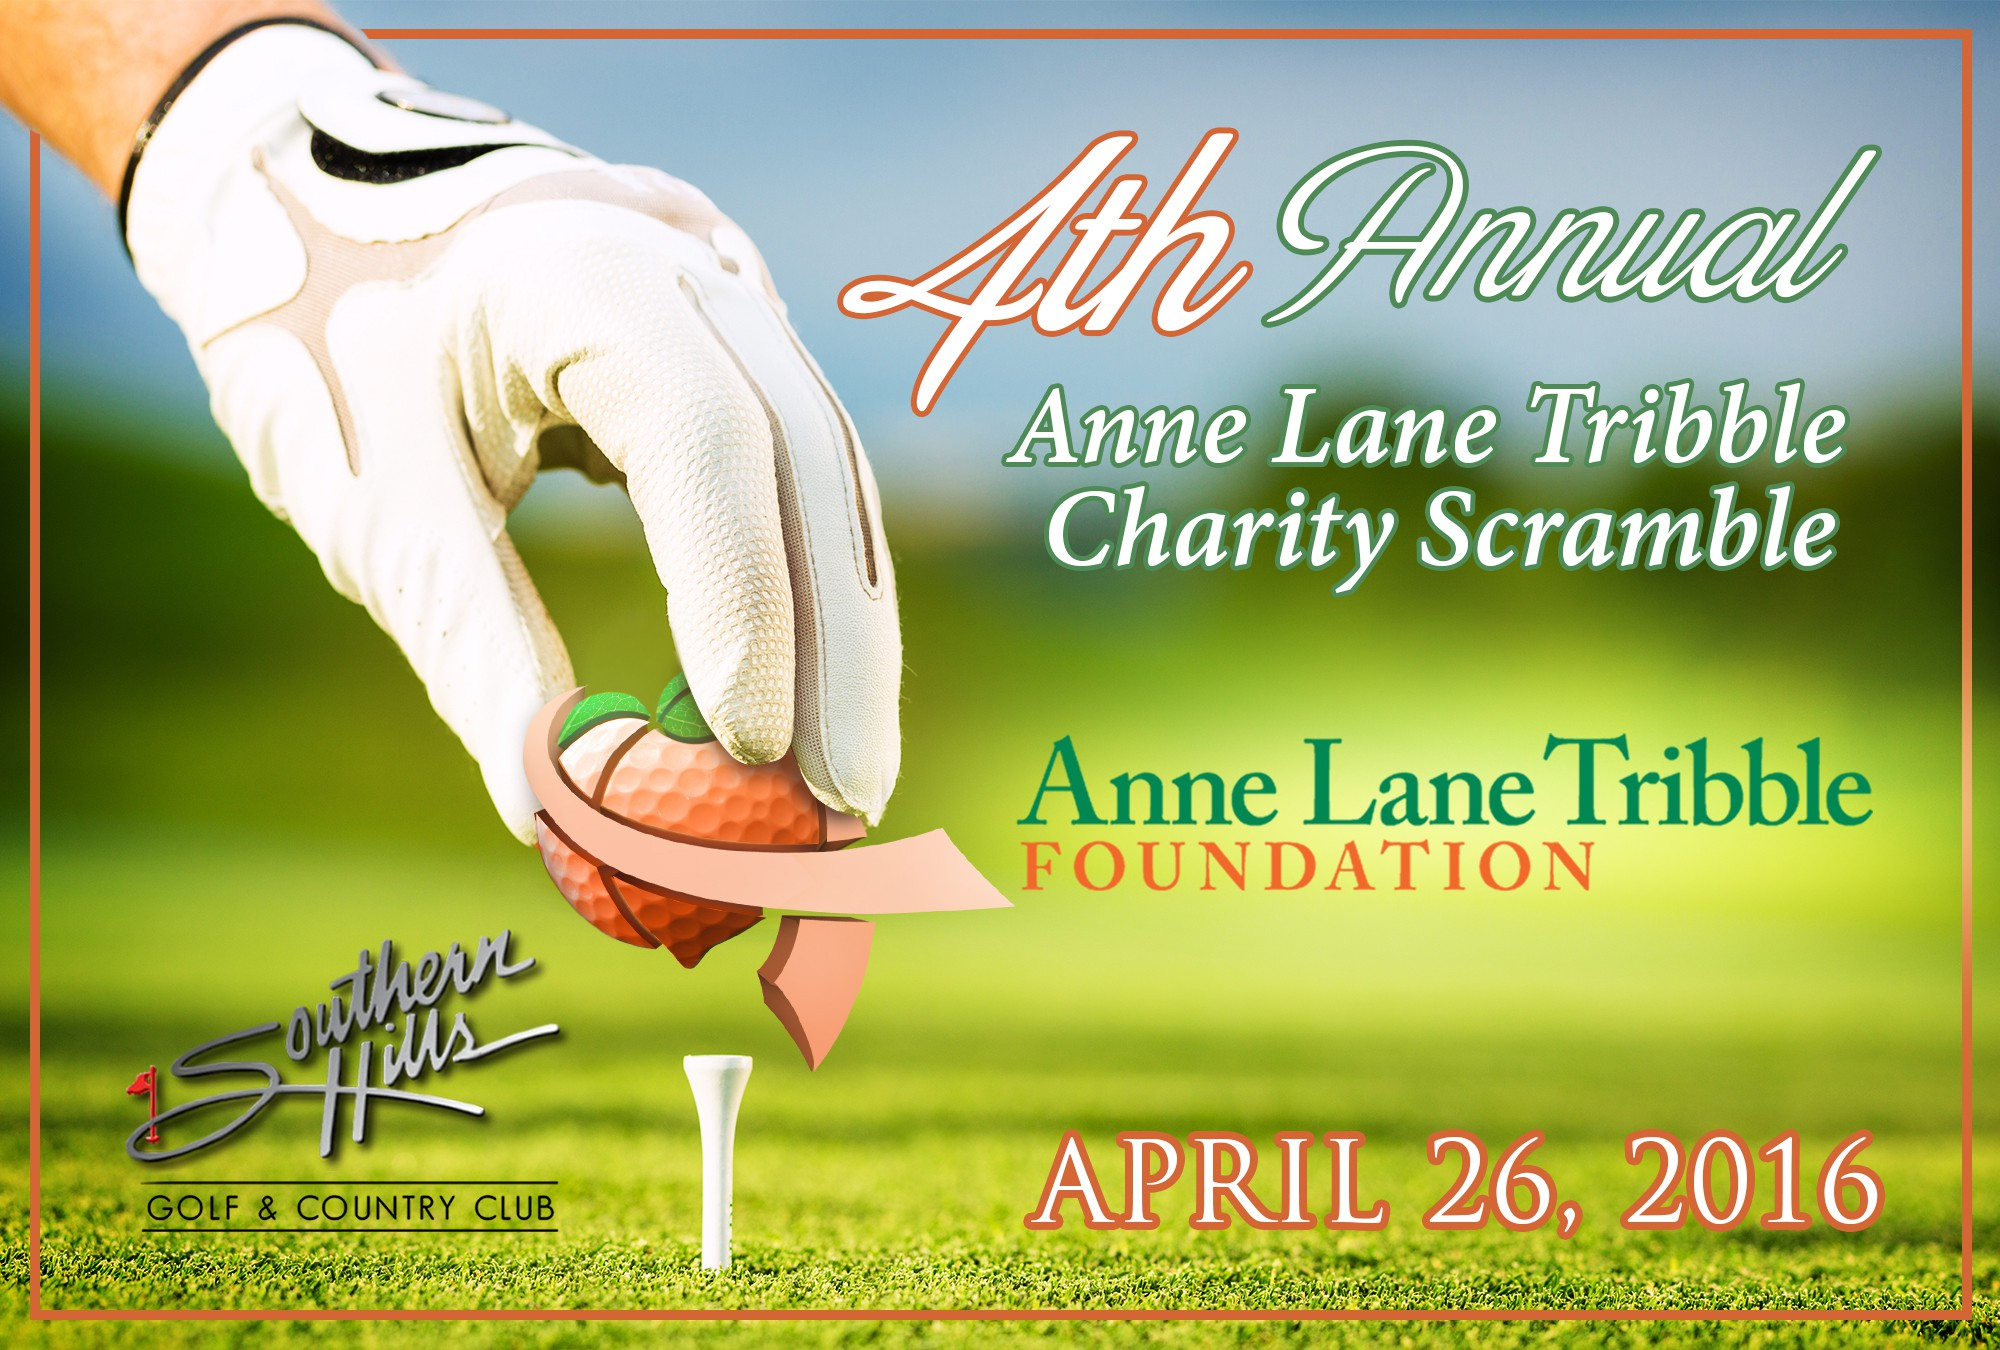 Create Golf Scorecard (Postcard) for 4th Annual Charity Tournament